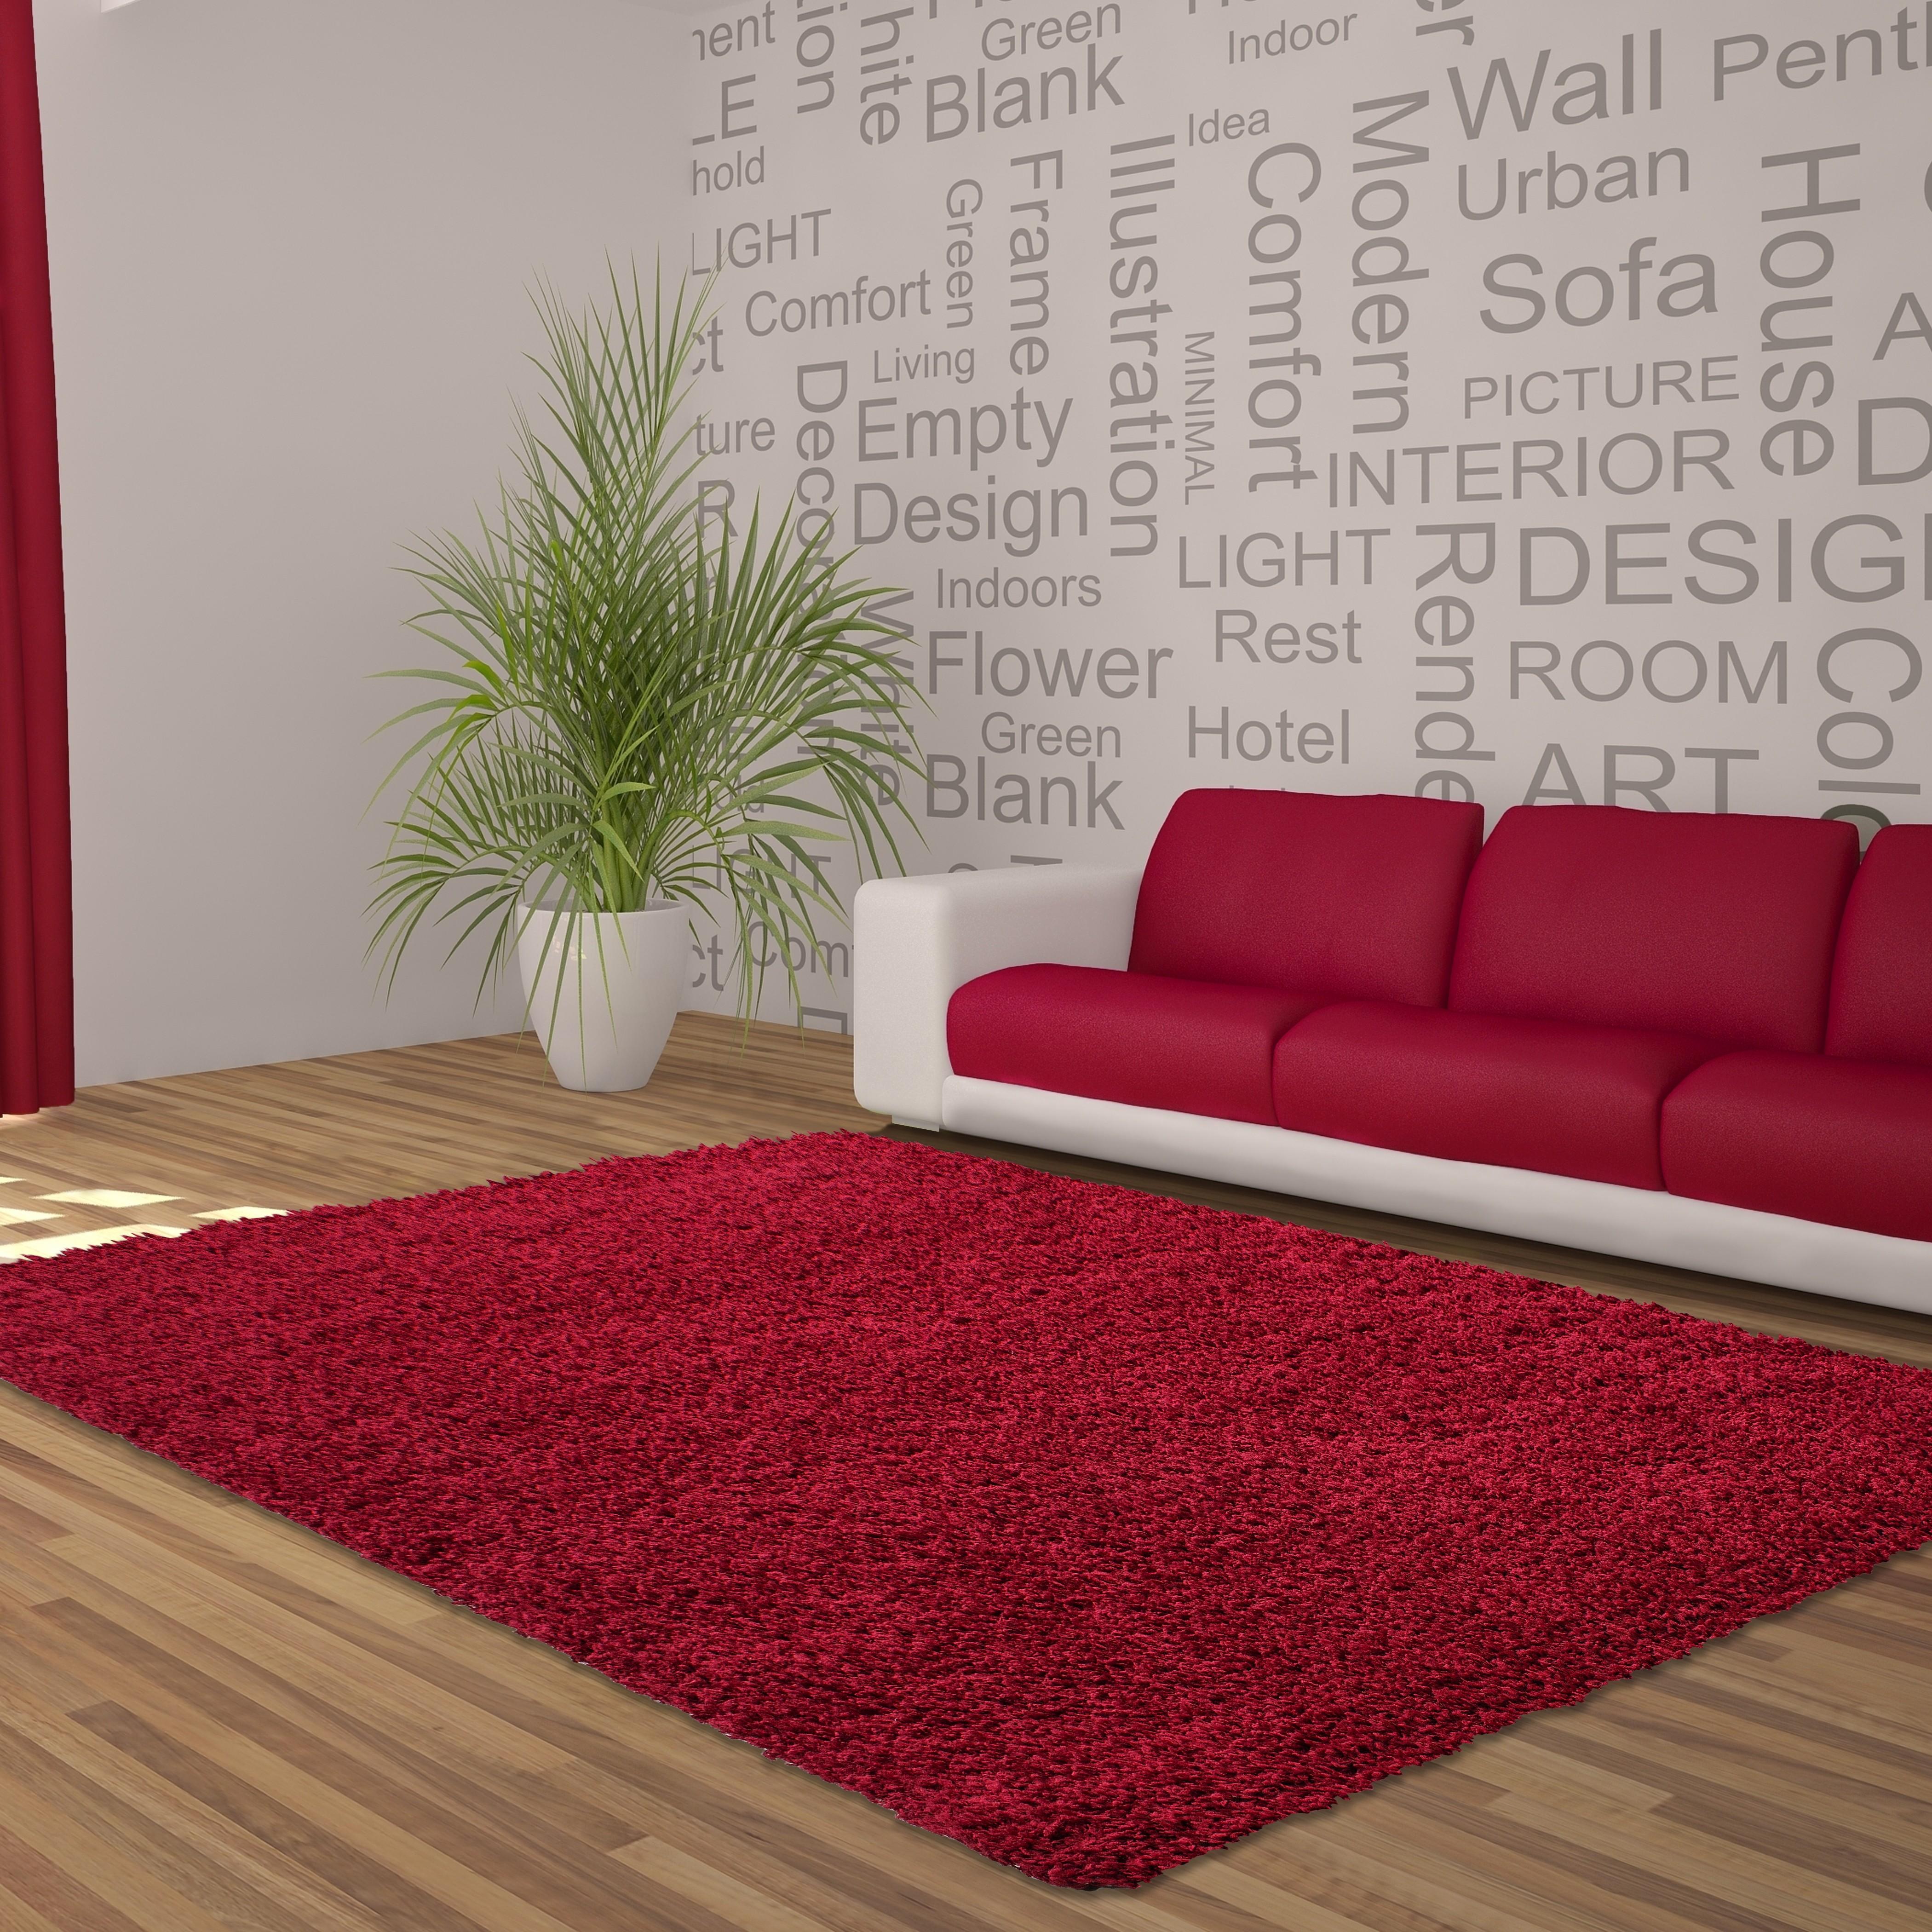 Tapis shaggy cream moderne tapis design uni en polypropylène VASCO